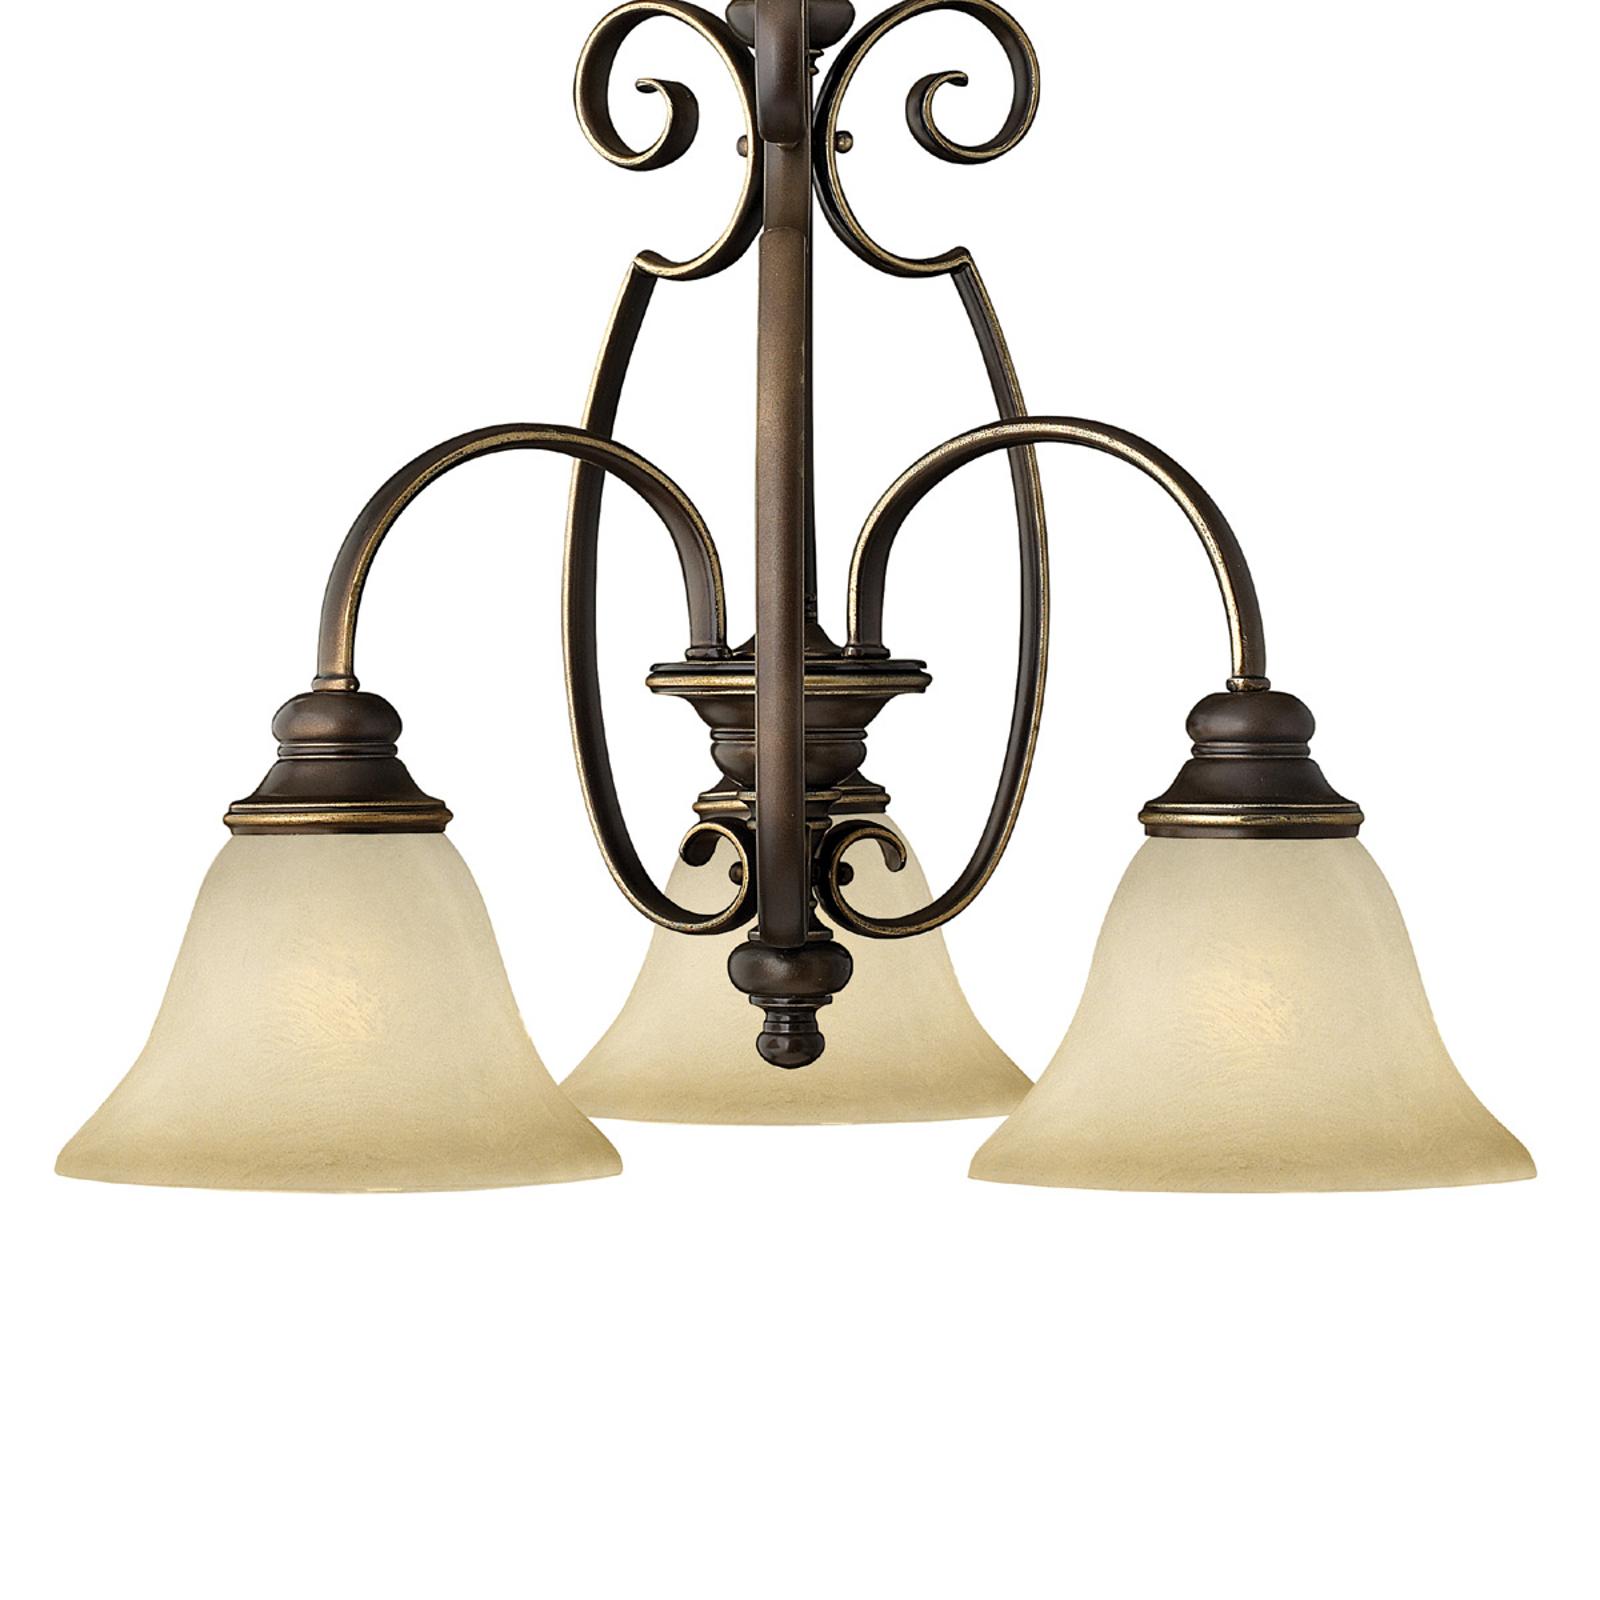 Hanglamp CELLO, 3-lichts